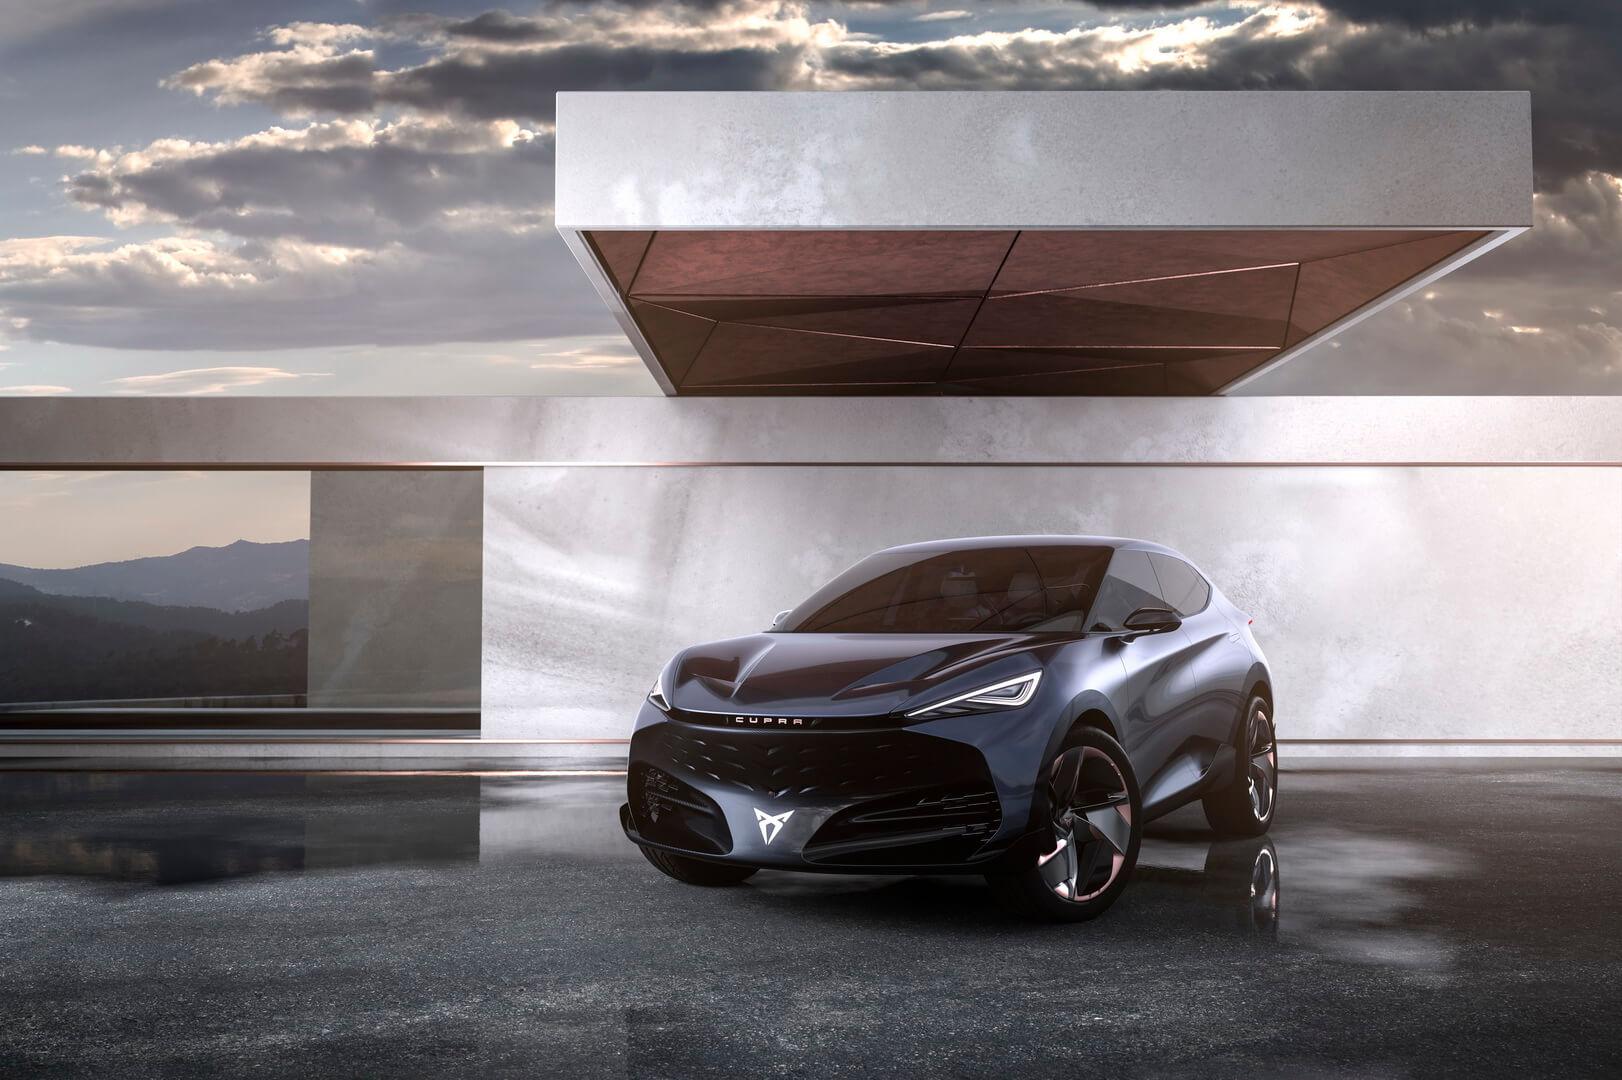 CUPRA представила электрический концепт внедорожника-купе Tavascan